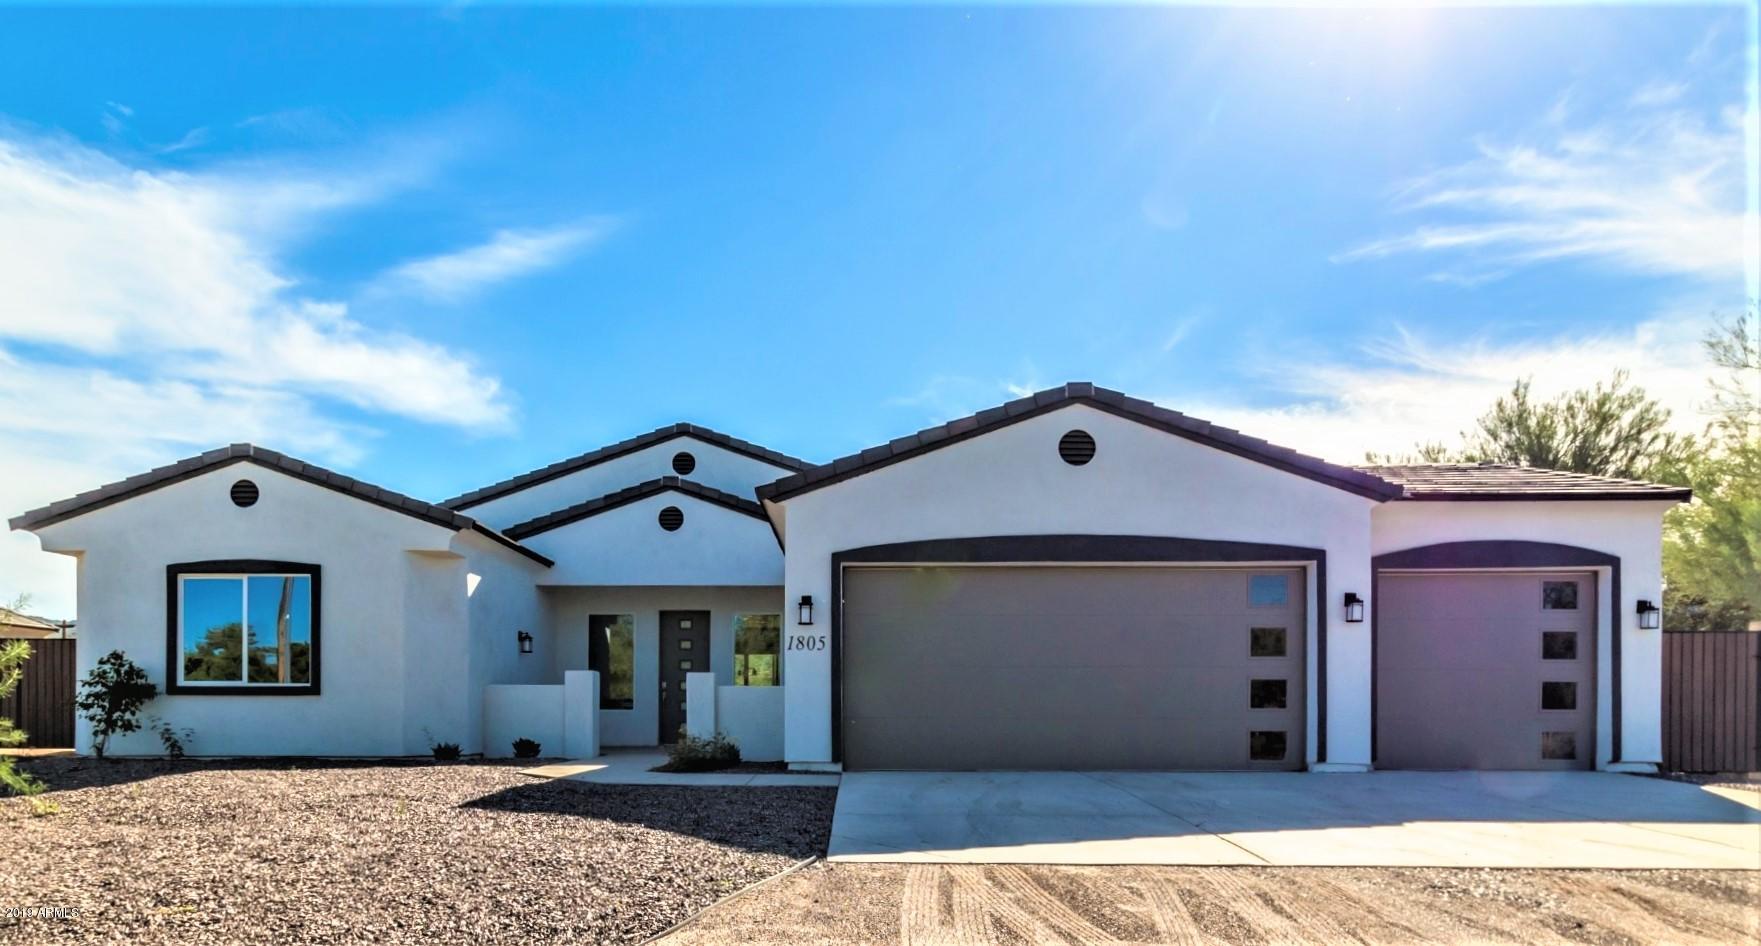 MLS 5976067 1805 W PIEDMONT Road, Phoenix, AZ 85041 Equestrian Homes in Phoenix